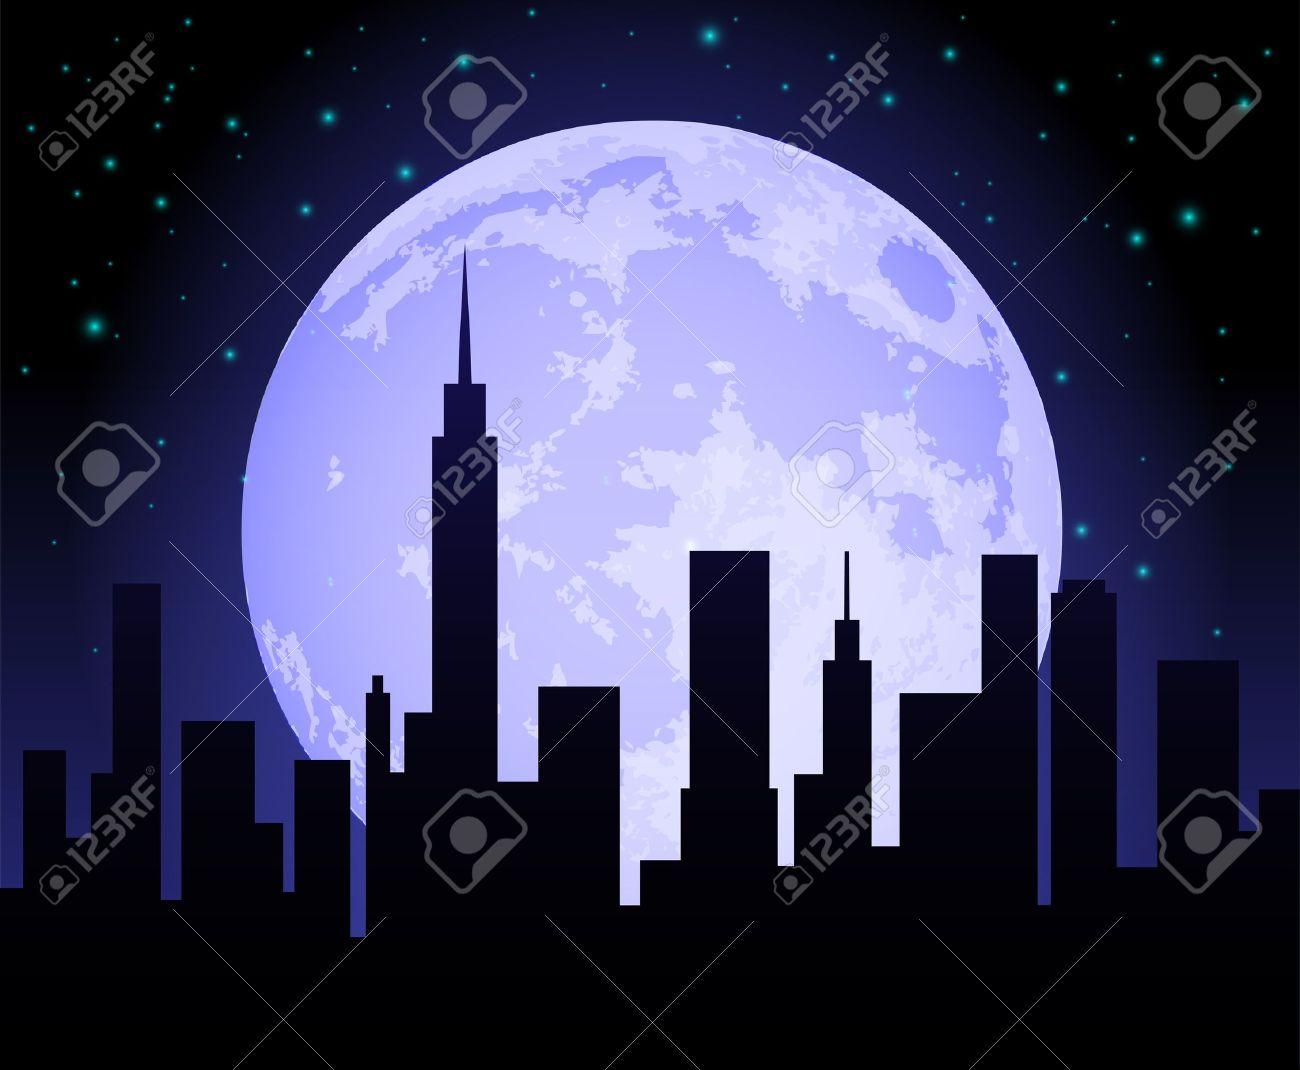 Cartoon City Skyline Night City Night City Skyline at